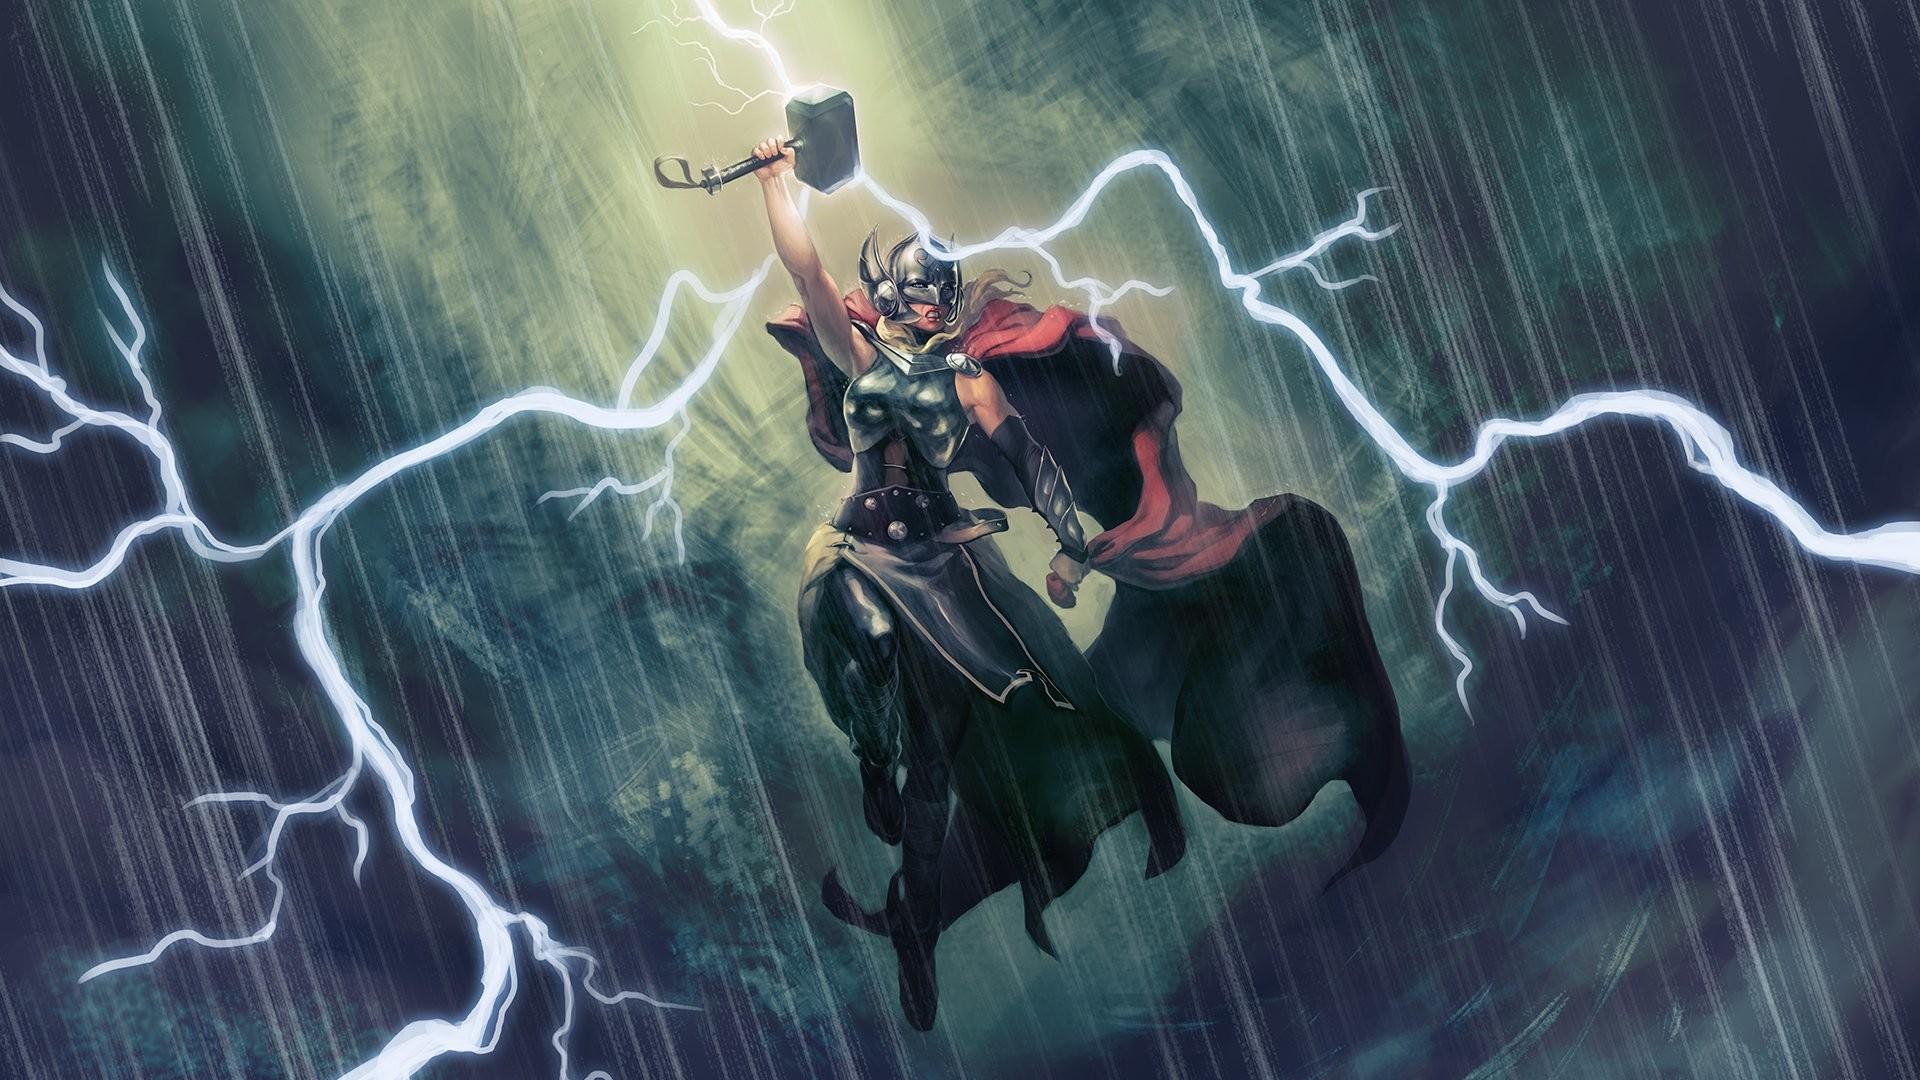 Thor wallpaper hd 77 images - Thor art wallpaper ...